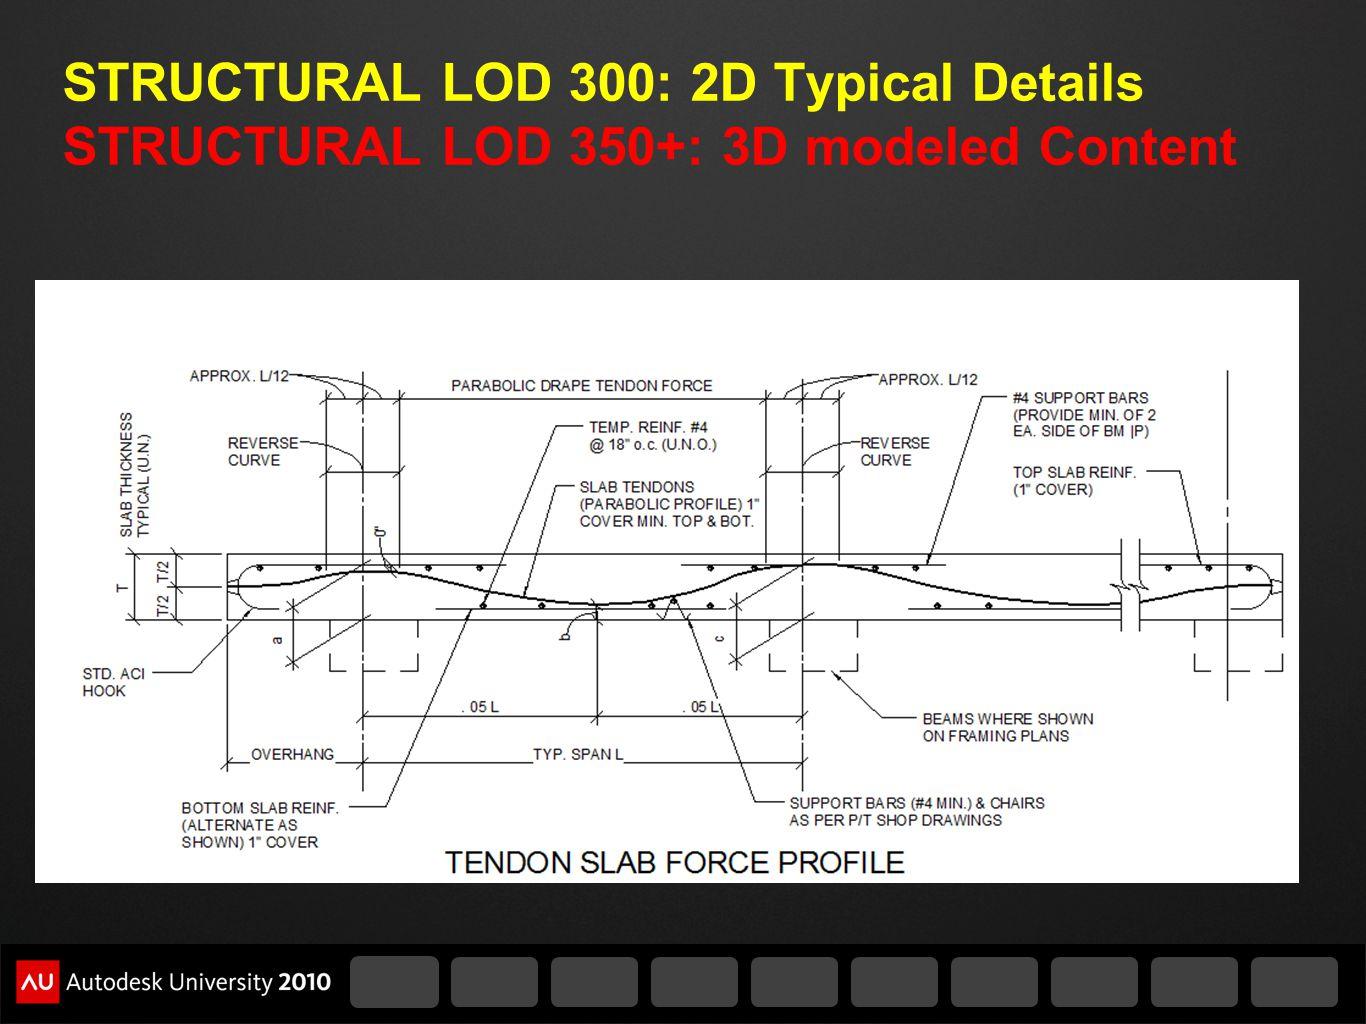 STRUCTURAL LOD 300: 2D Typical Details STRUCTURAL LOD 350+: 3D modeled Content